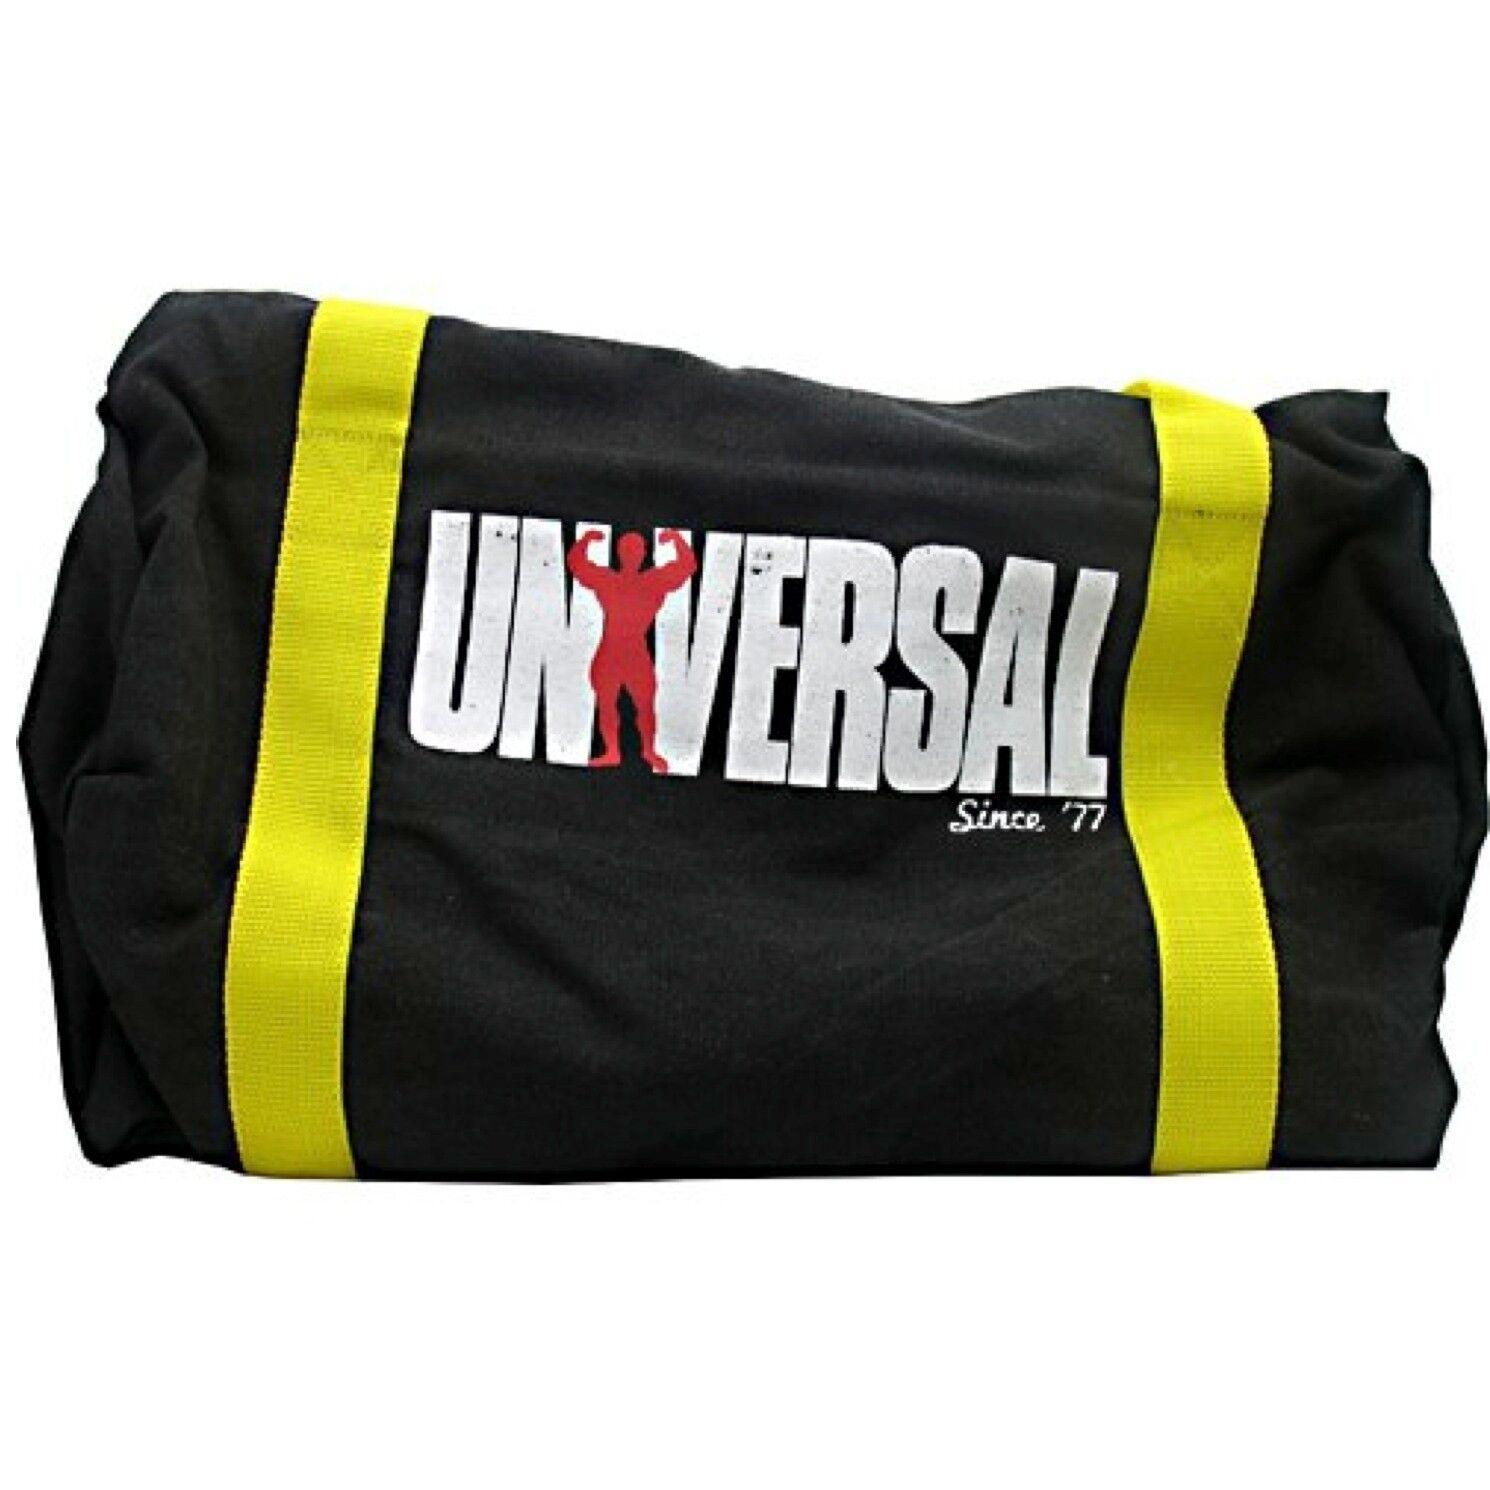 Universal Nutrition Large OverGrößed Animal Gym Bag Athletic Sports Supplies Bag Bag Supplies 21f7d8